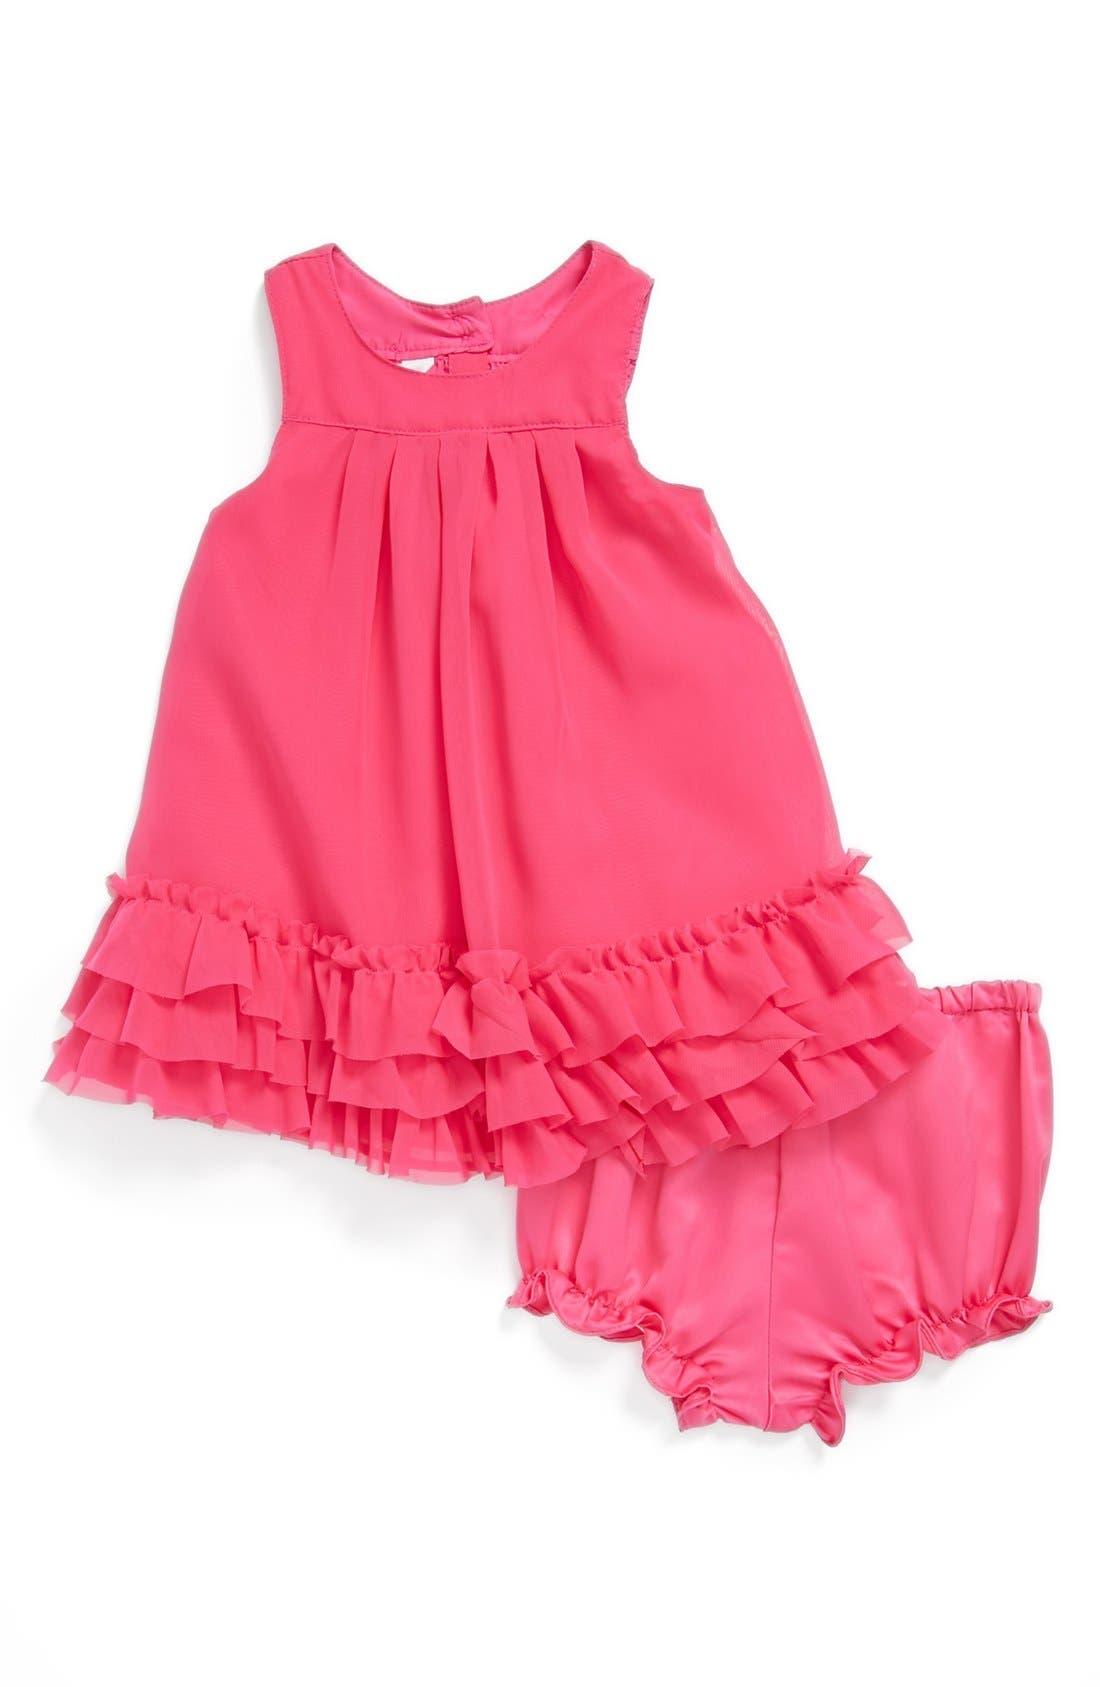 Alternate Image 1 Selected - Pippa & Julie Chiffon Dress & Bloomers (Baby Girls)